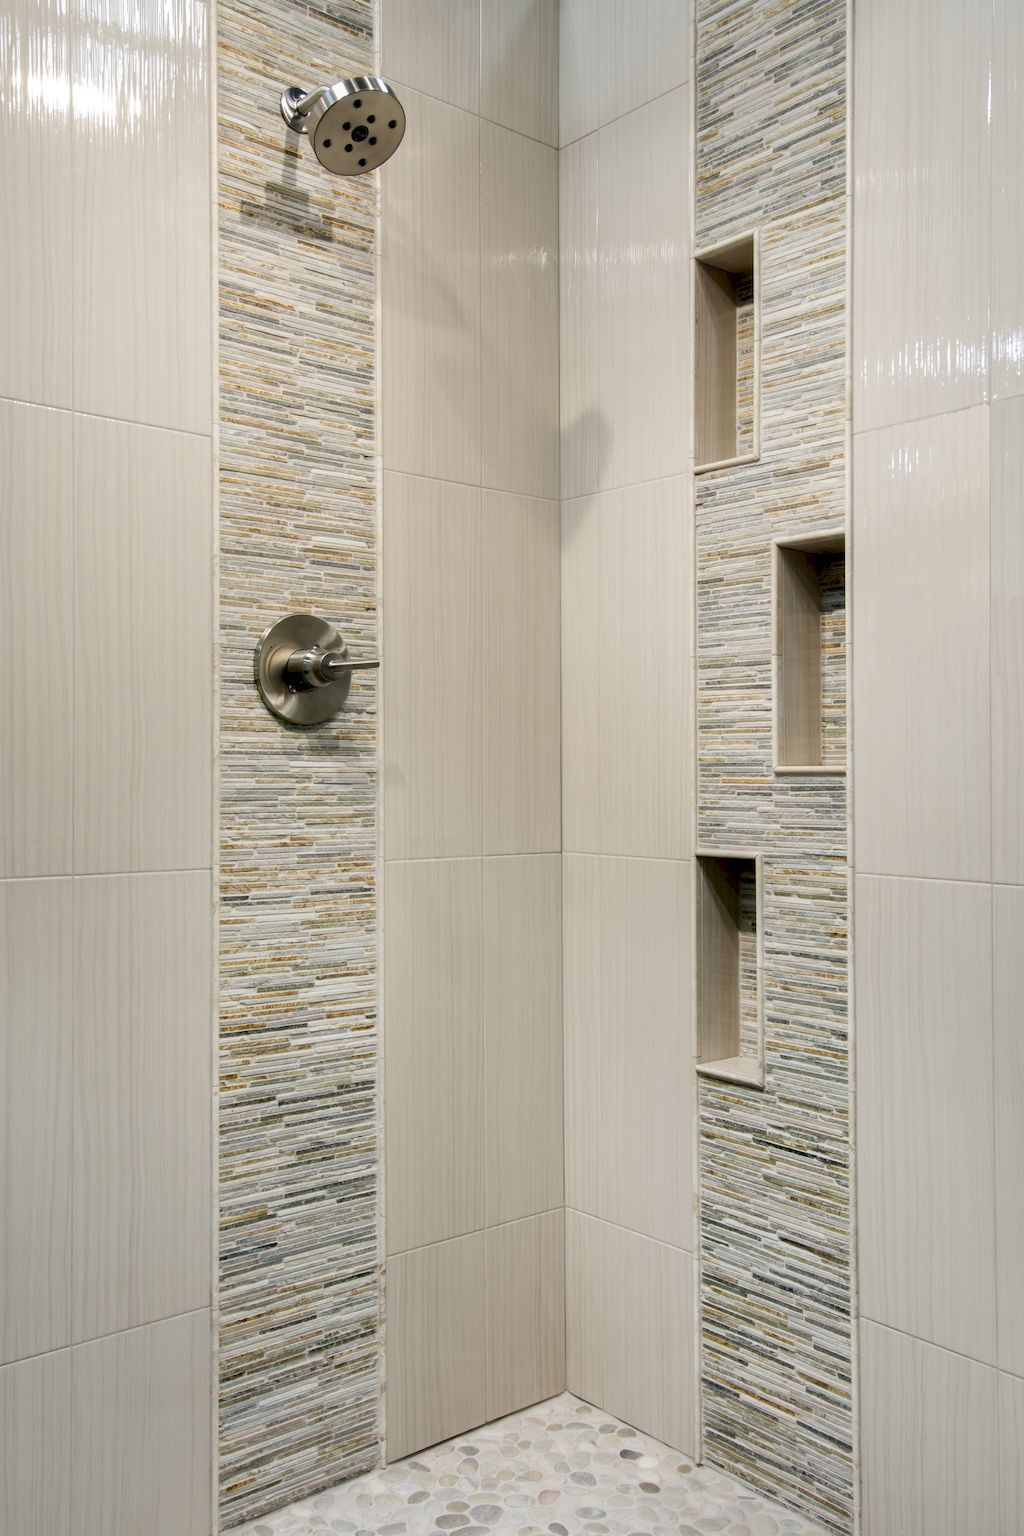 50 Beautiful Bathroom Shower Tile Ideas 39 Small